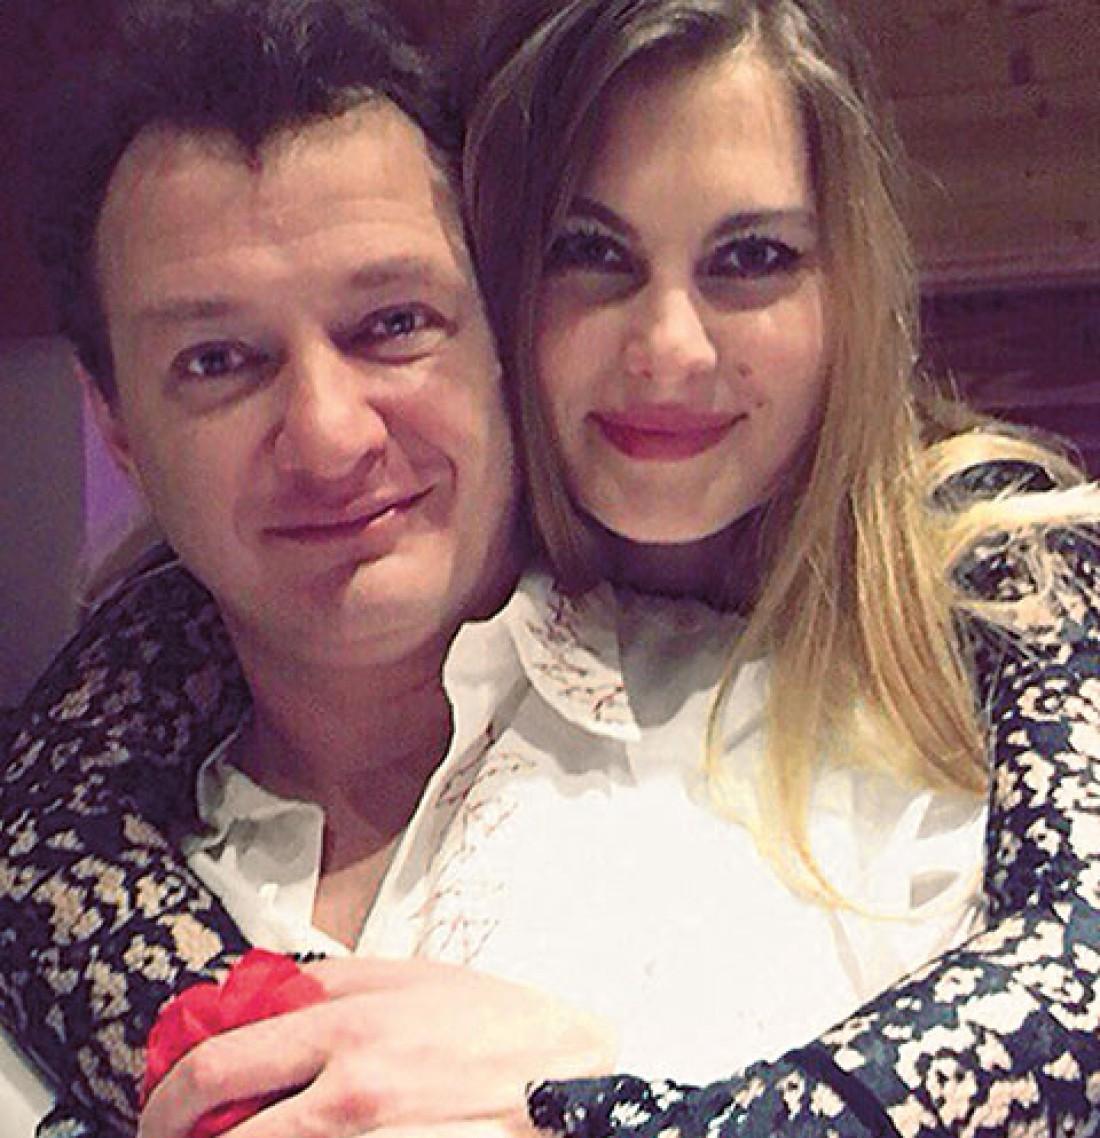 Актер Марат Башаров и Елизавета Шевыркова скоро станут родителями